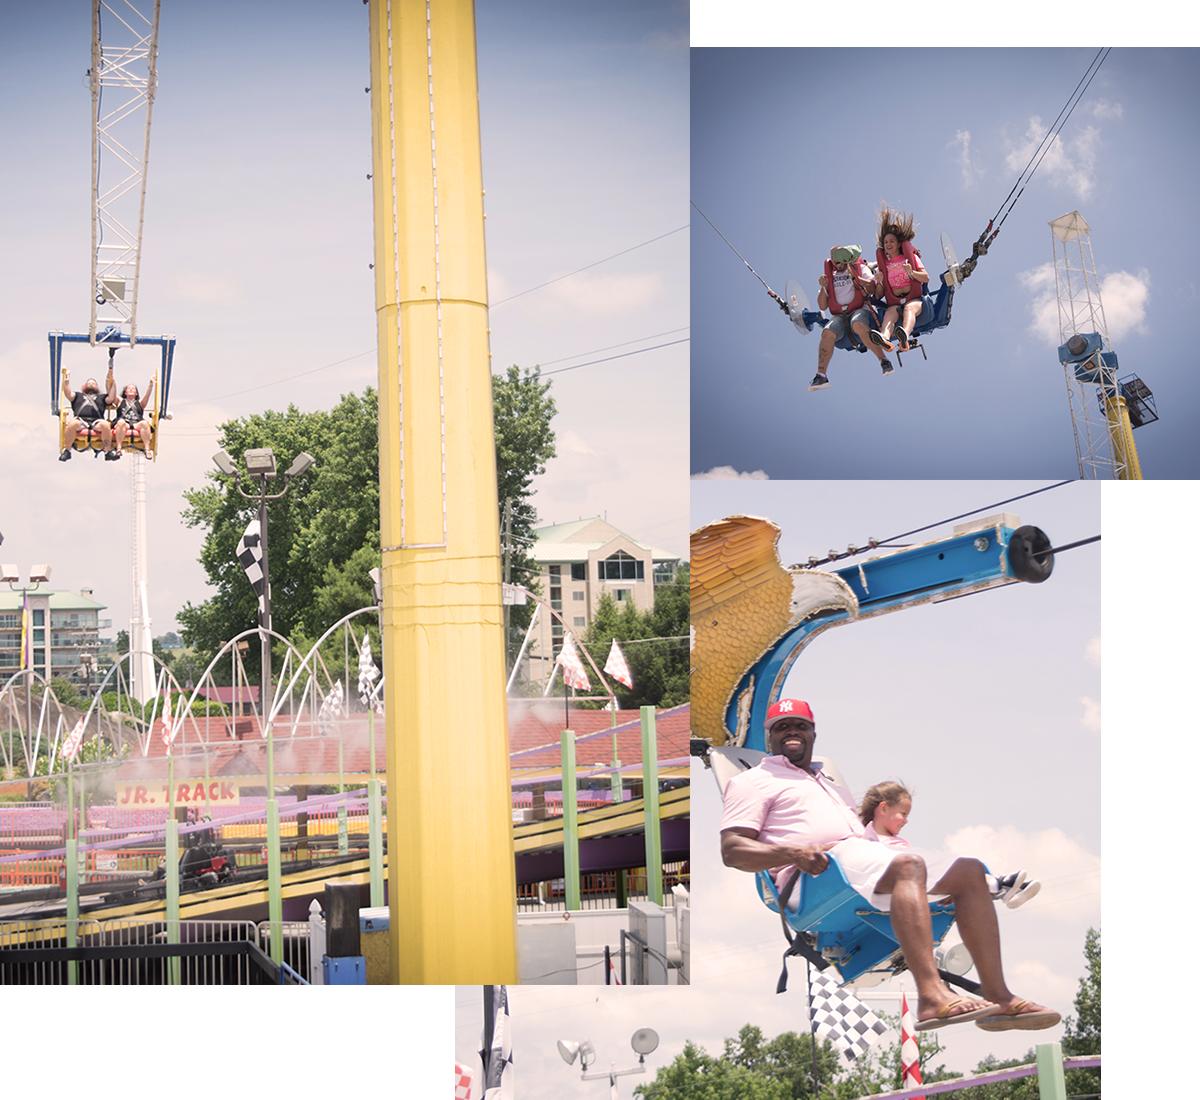 Fun Stop Family Action Park Rides